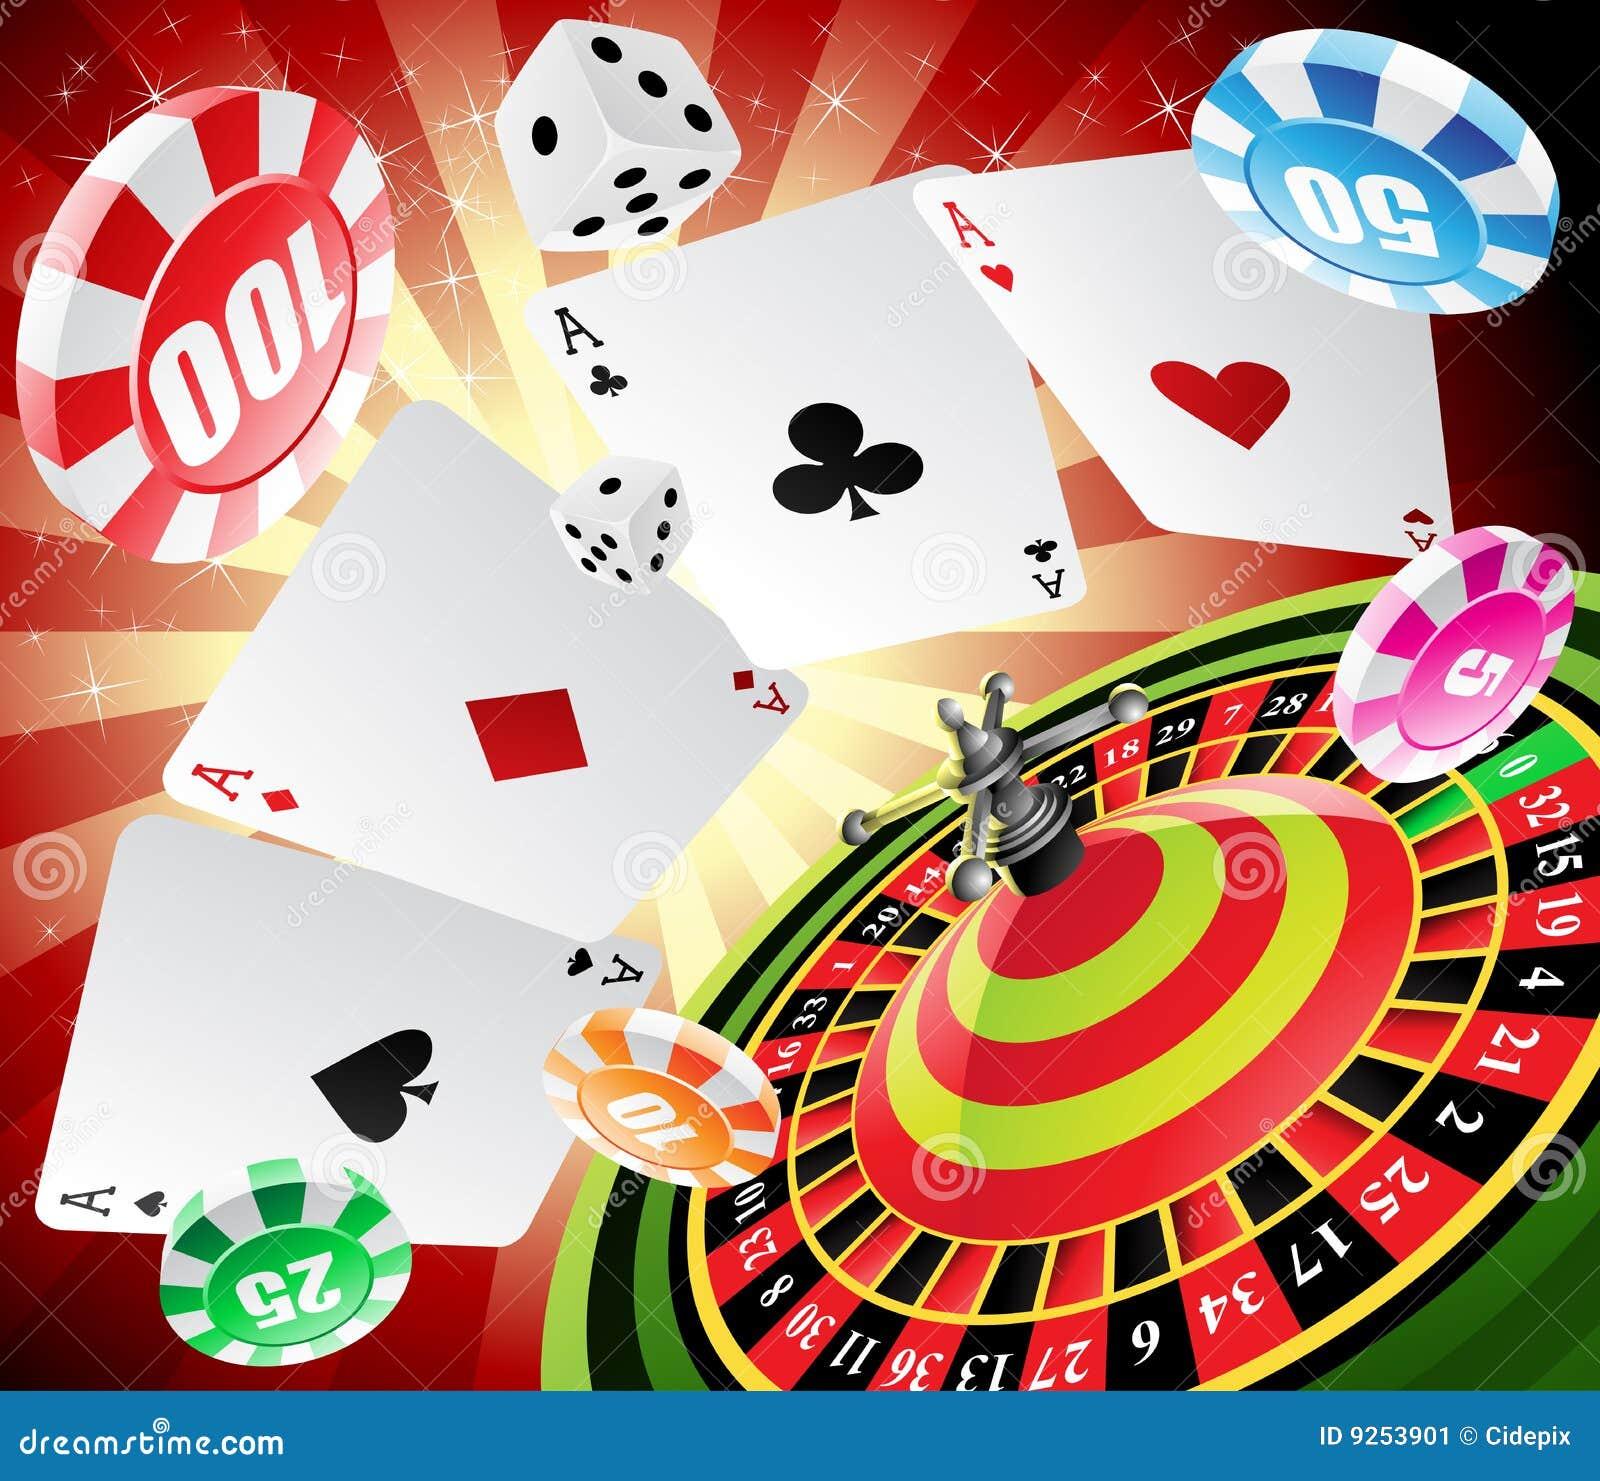 Juegos de SkillOnNet royal casino-990845